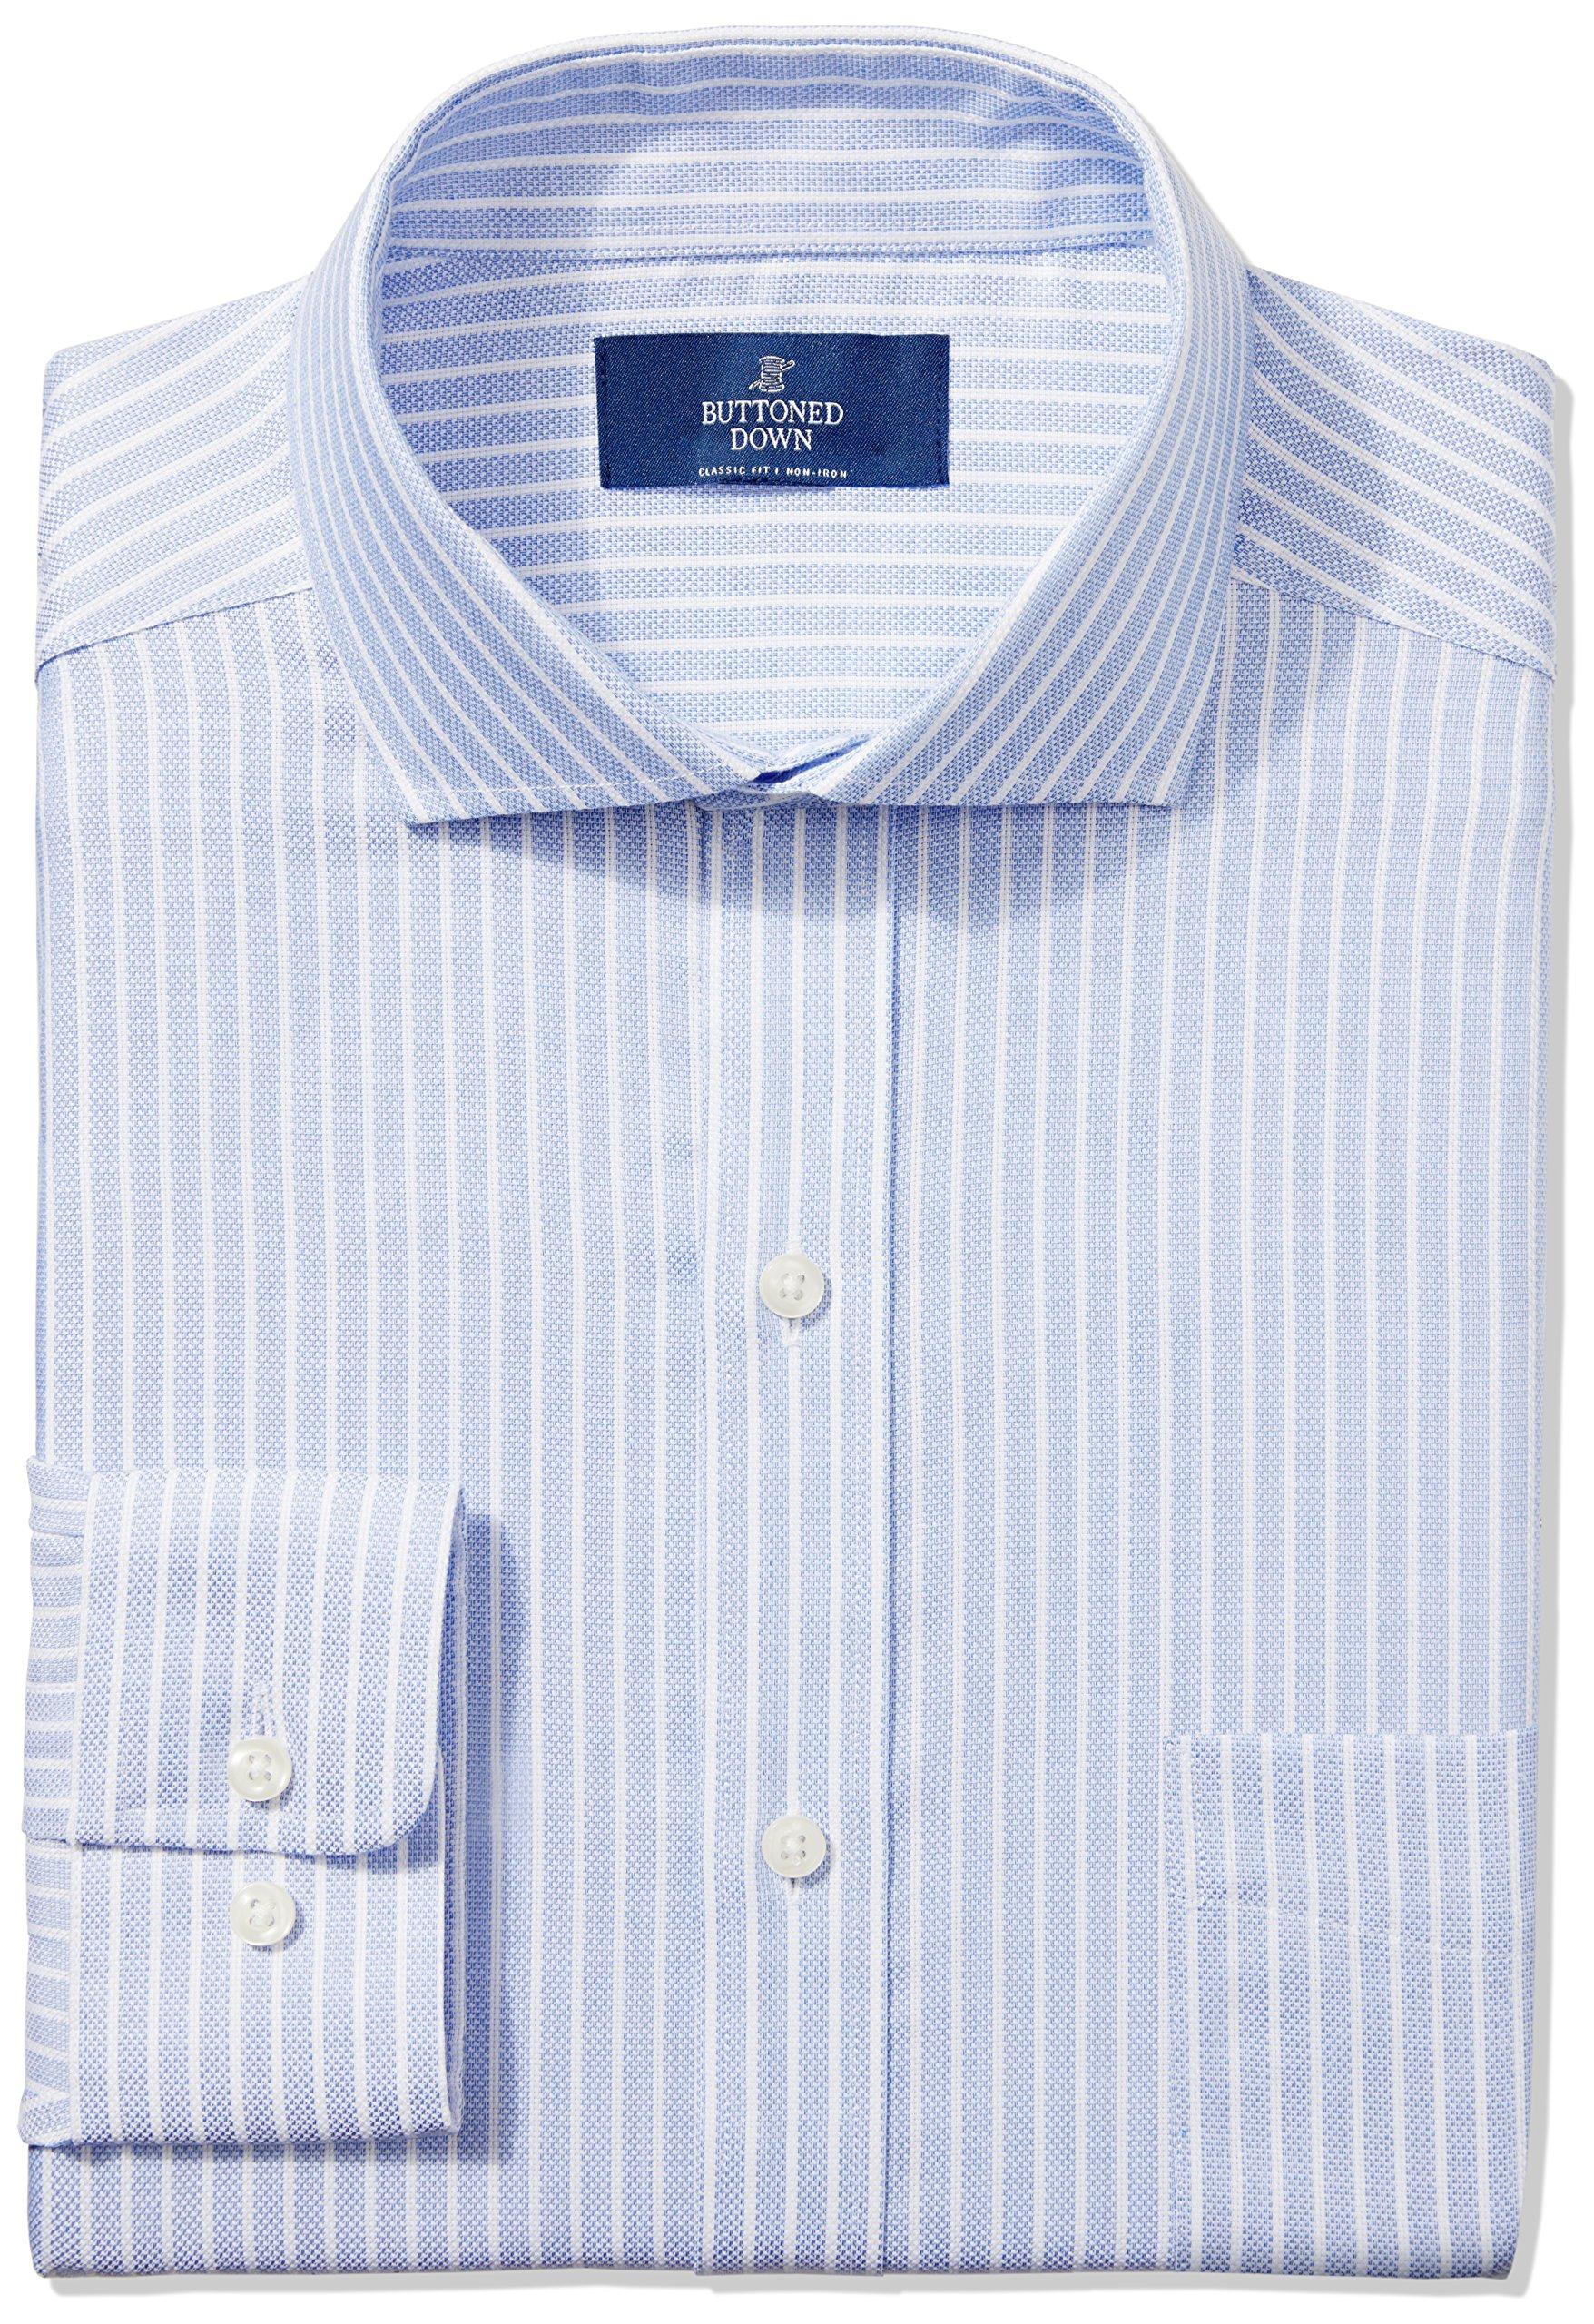 Buttoned Down Men's Classic Fit Cutaway-Collar Non-Iron Dress Shirt, Blue Textured Stripe, 16'' Neck 32'' Sleeve